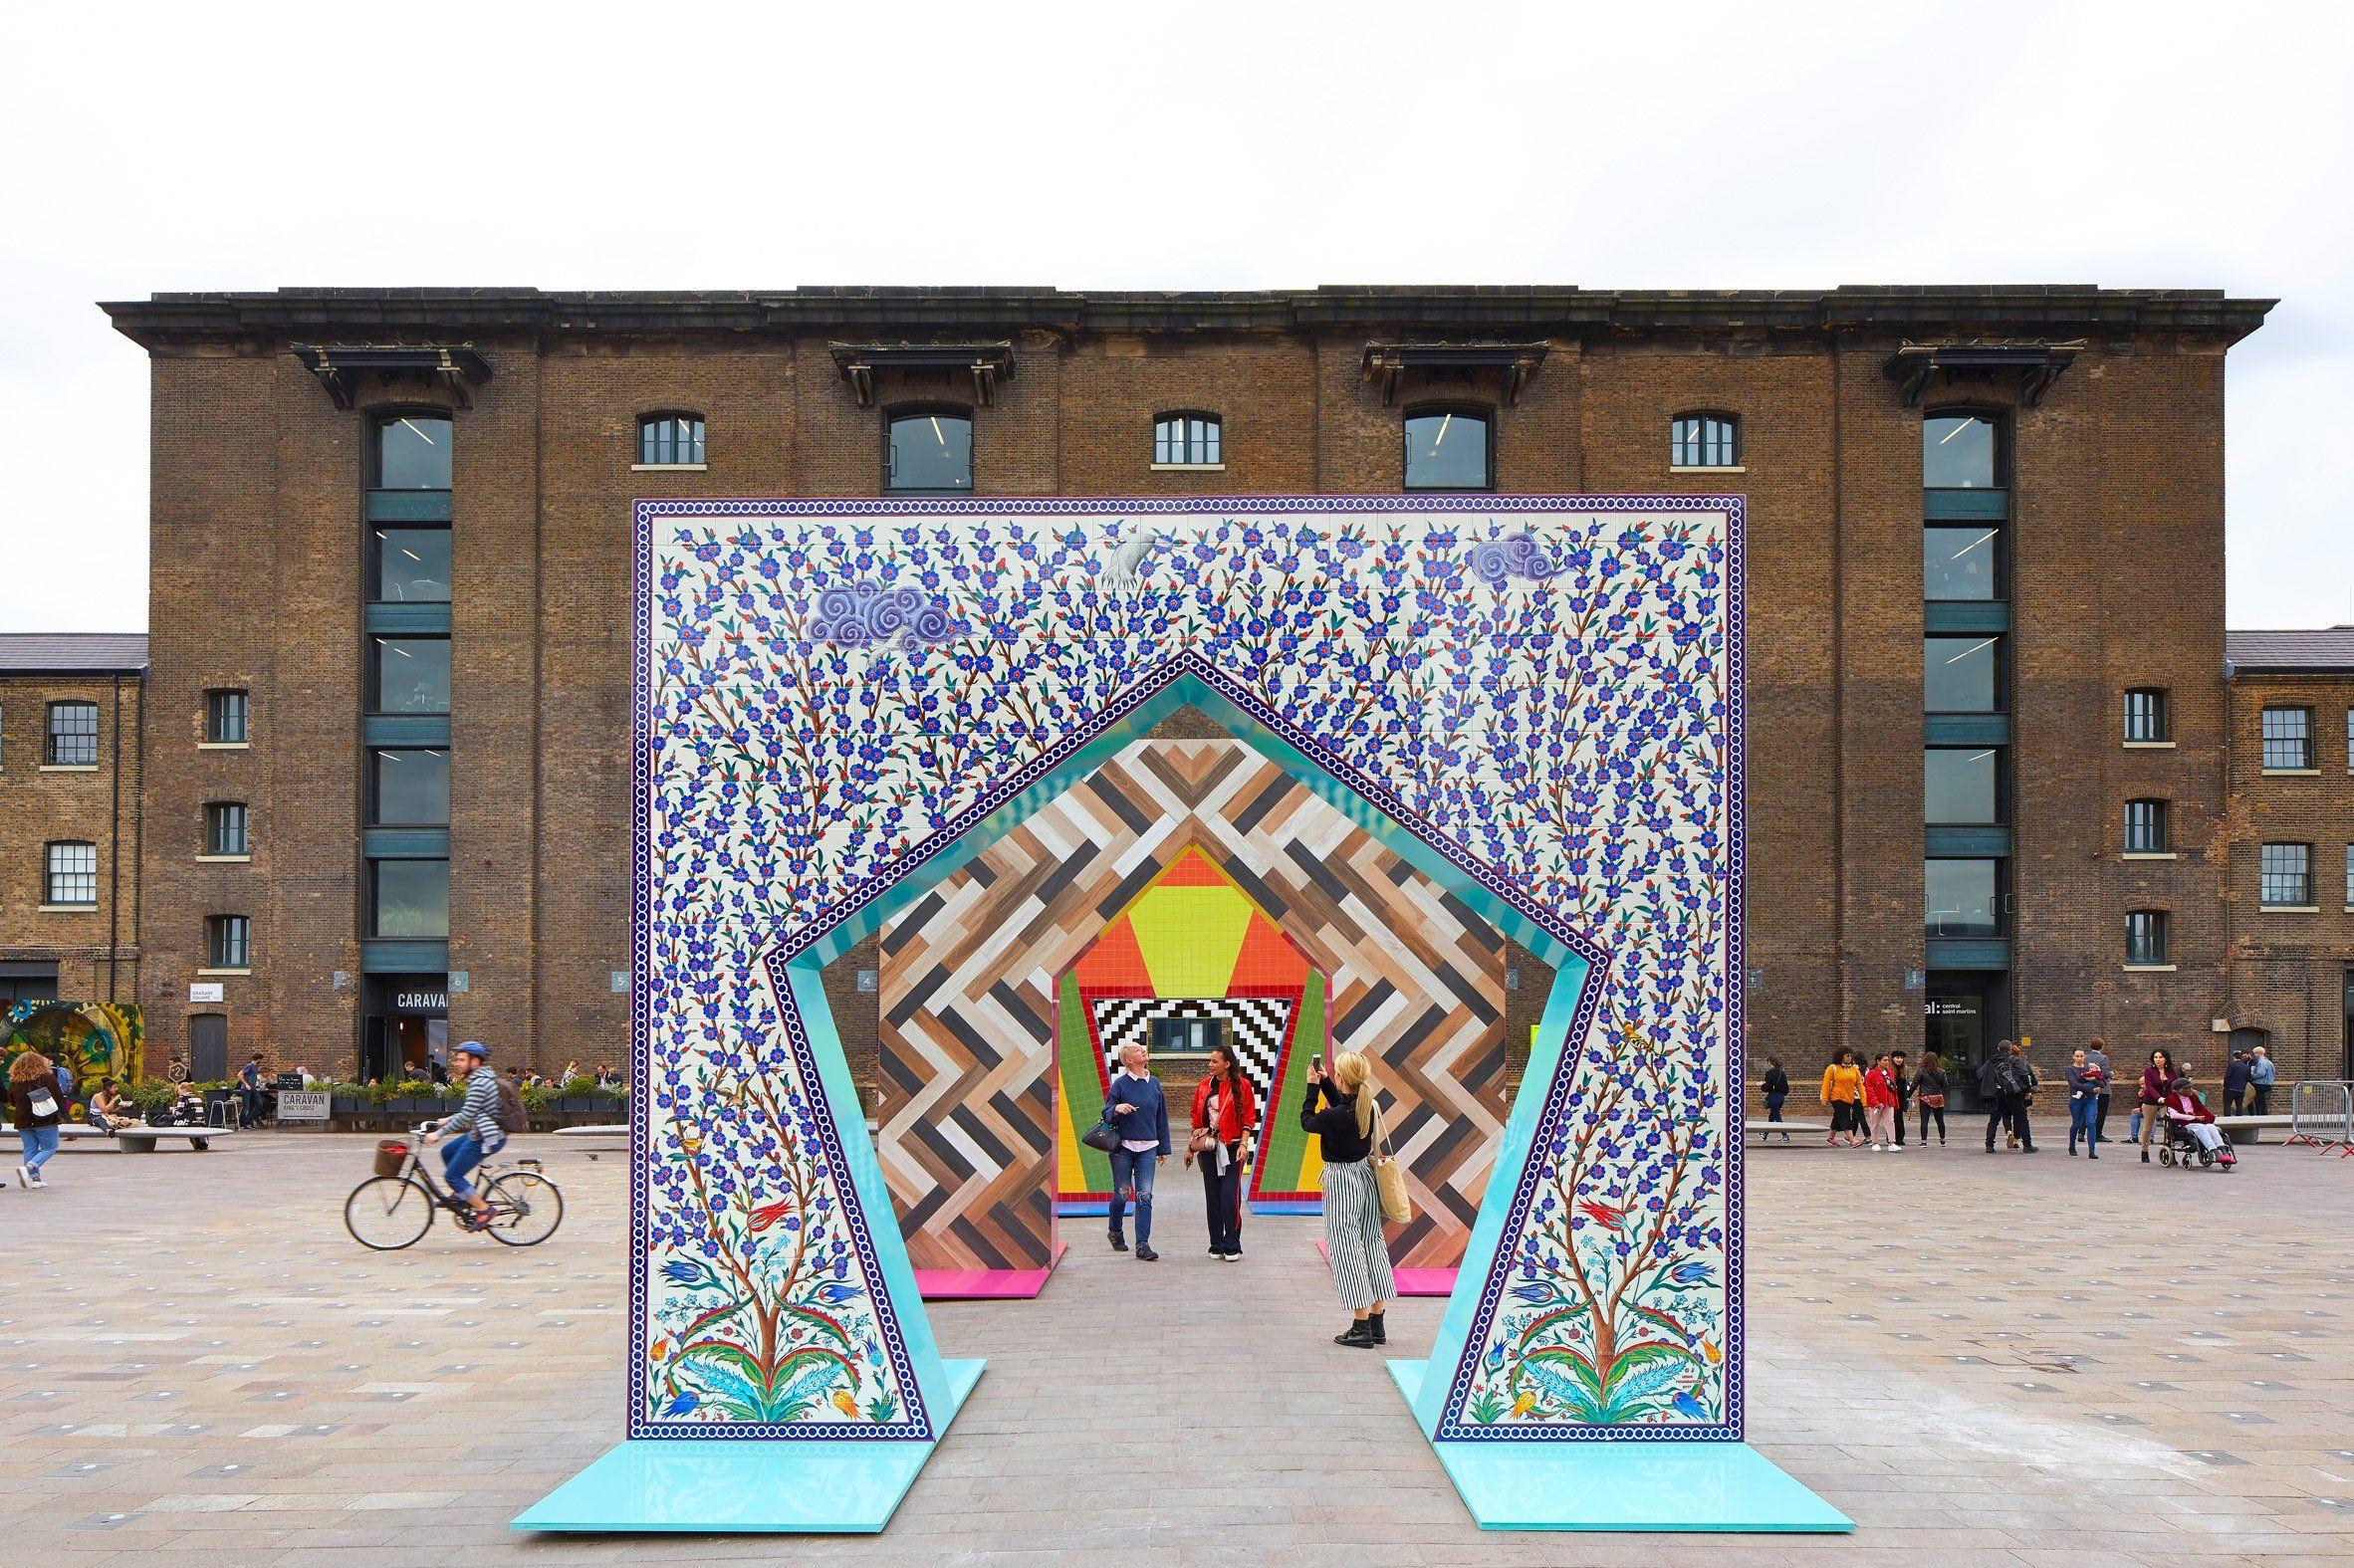 Gateways Installation By Adam Nathanial Firman History Of Ceramics Mosaic Art Environmental Graphic Design